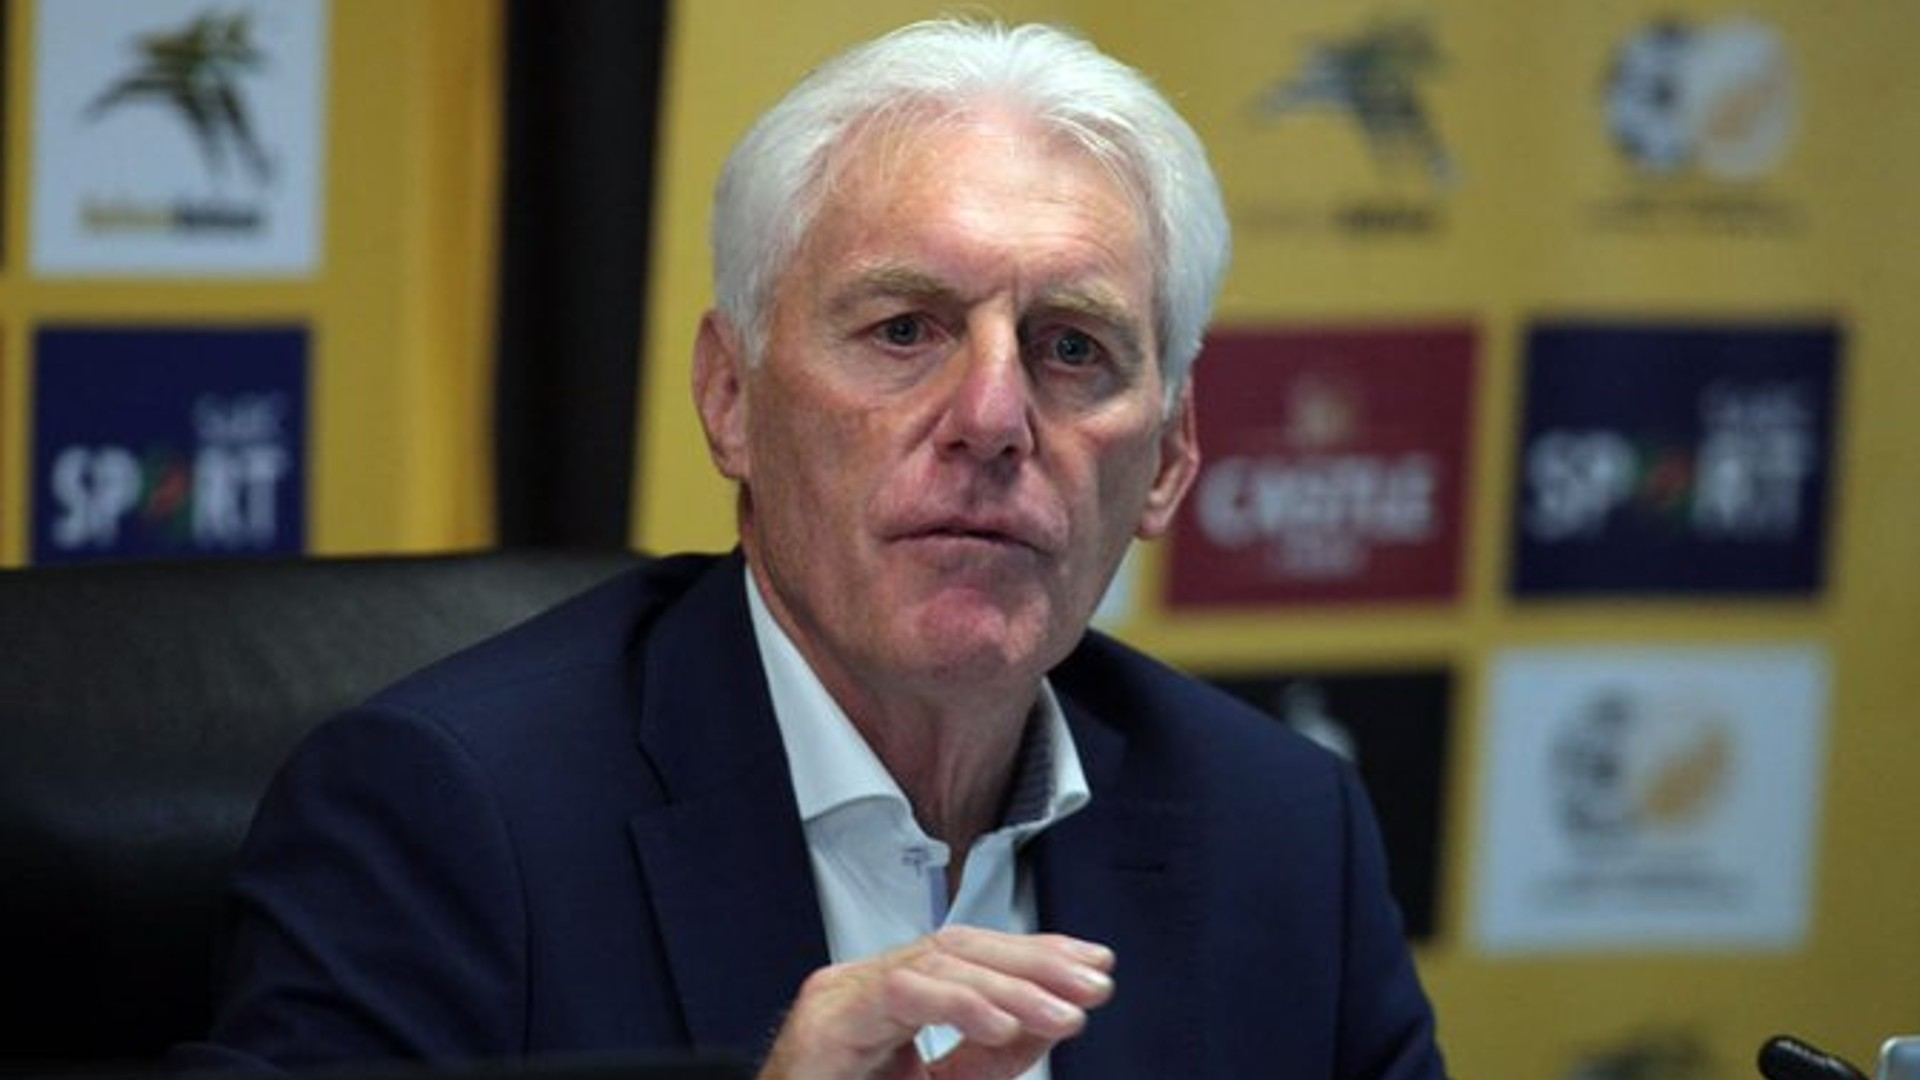 Bafana Bafana still looking for 'better players' despite strong start – Broos